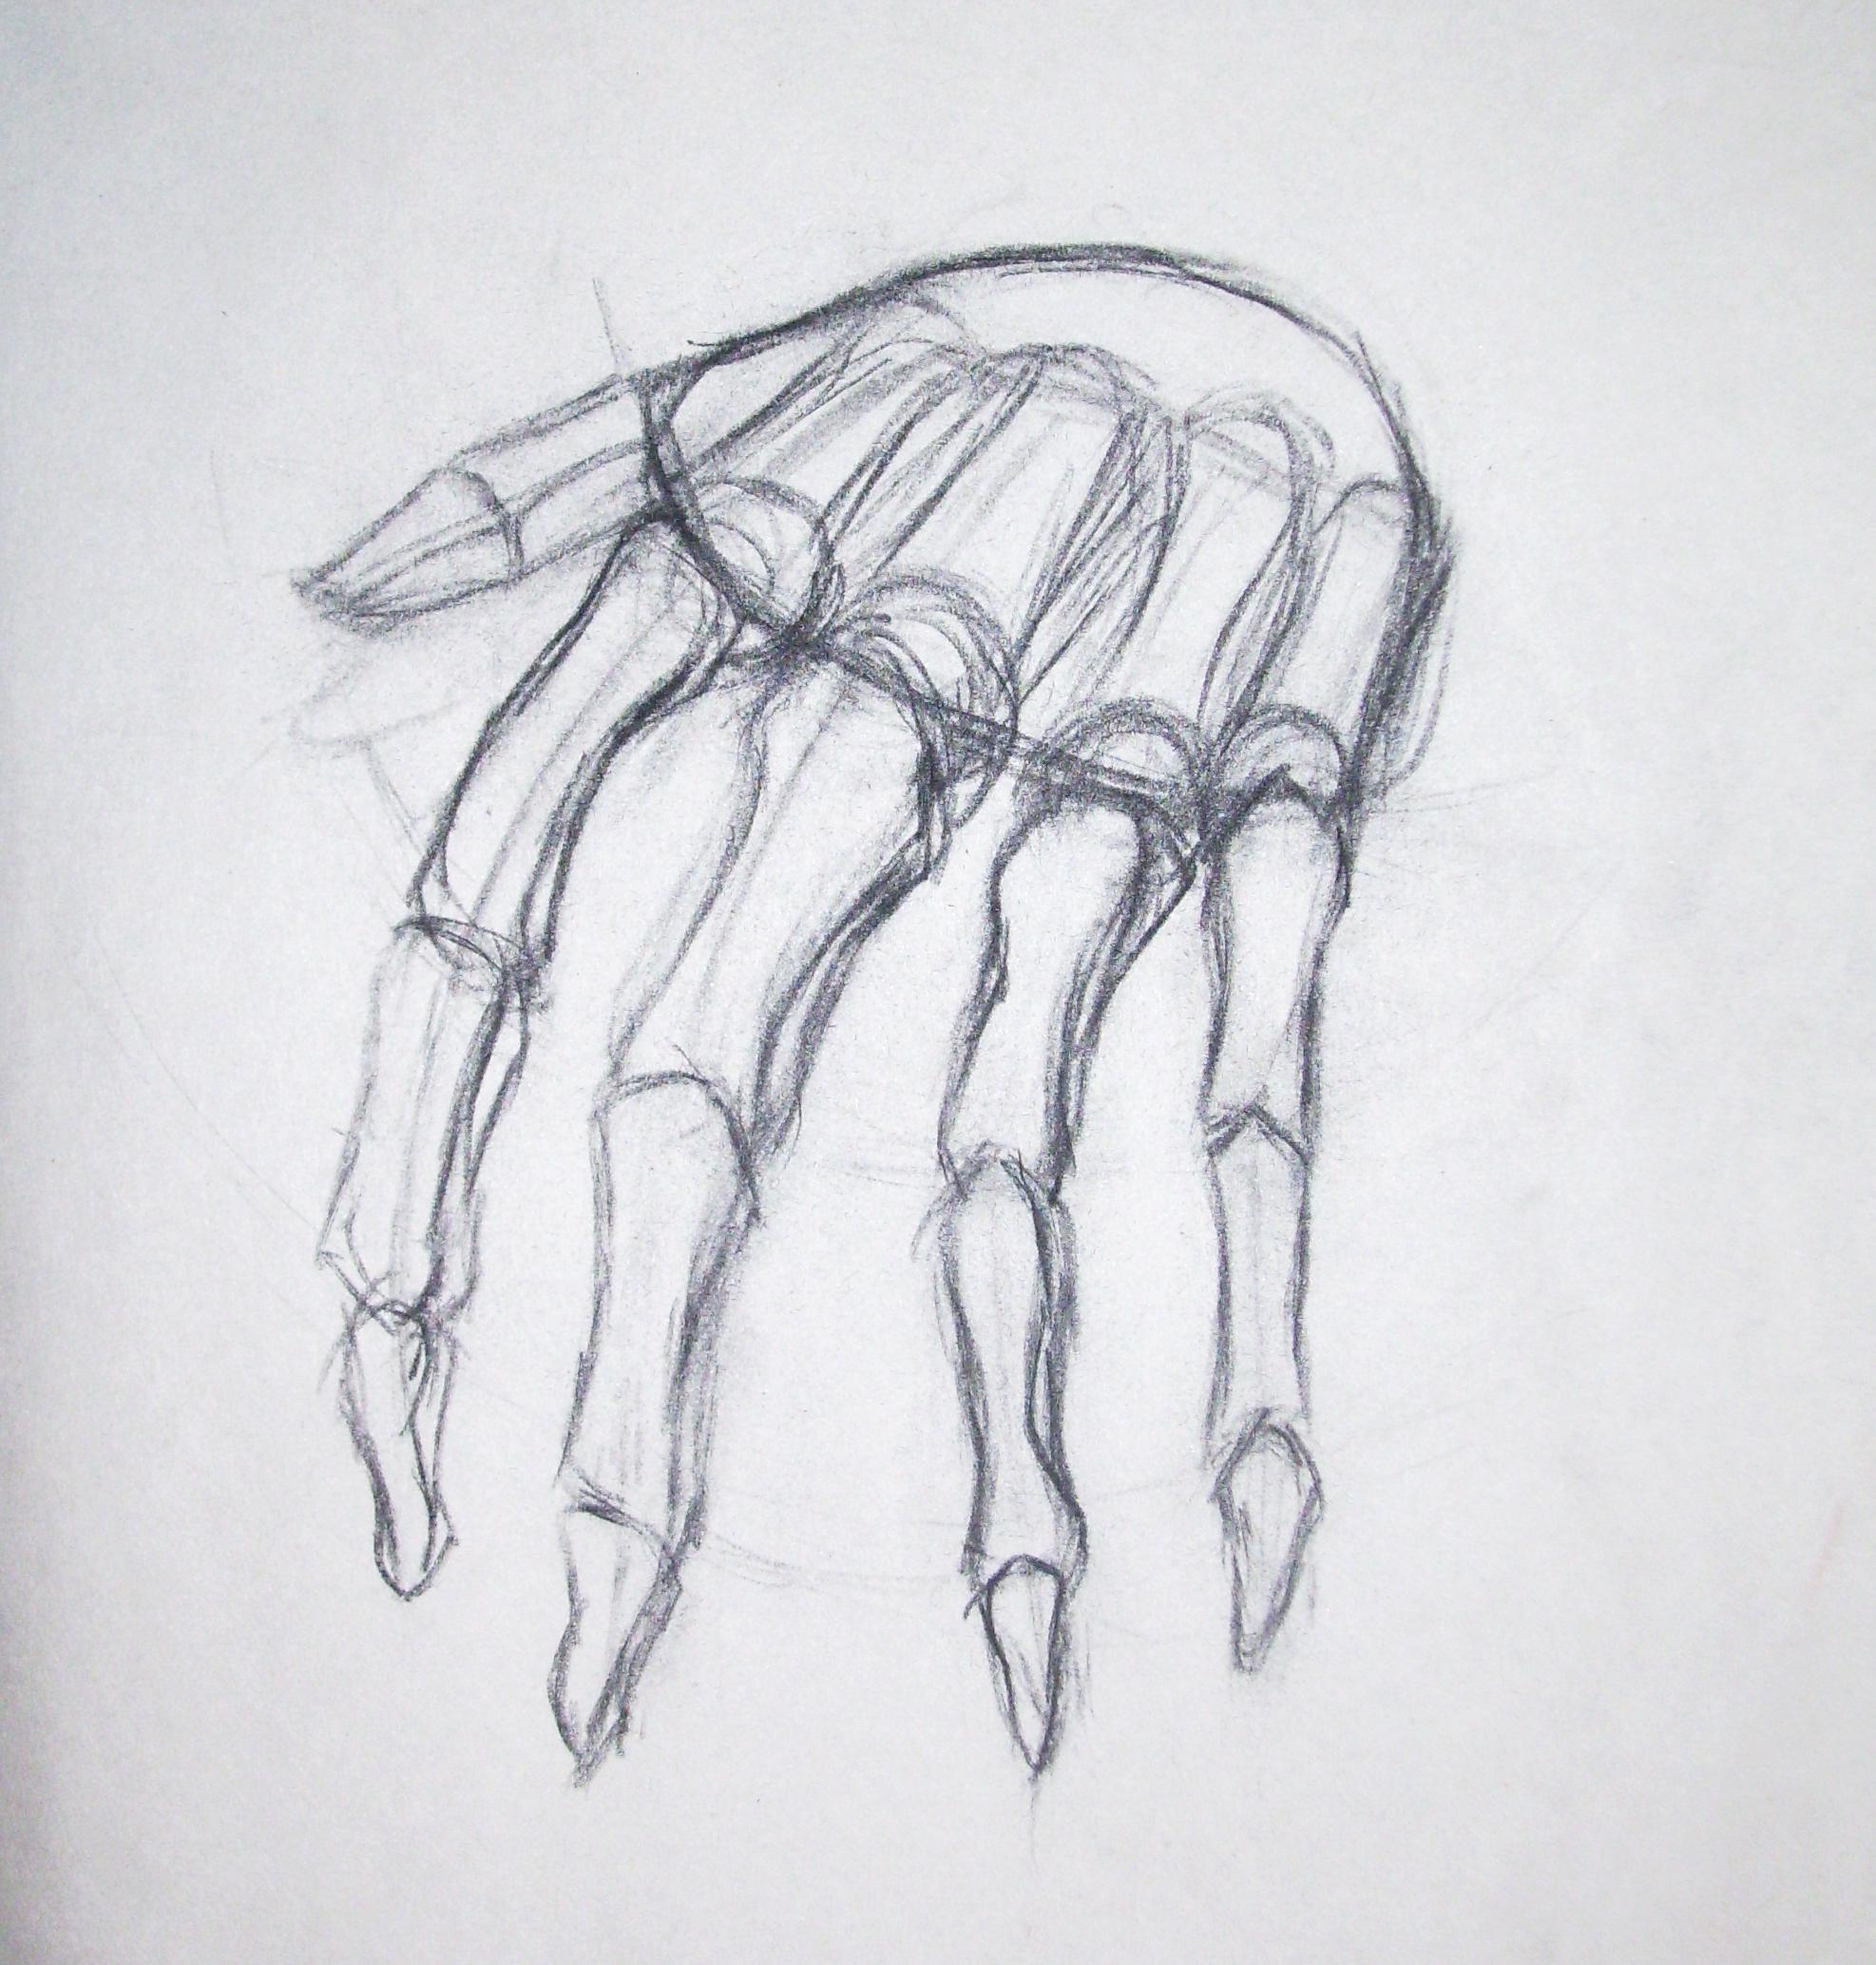 Drawn sleleton hand drawn Drawing: Skeleton Simple Hand Simple